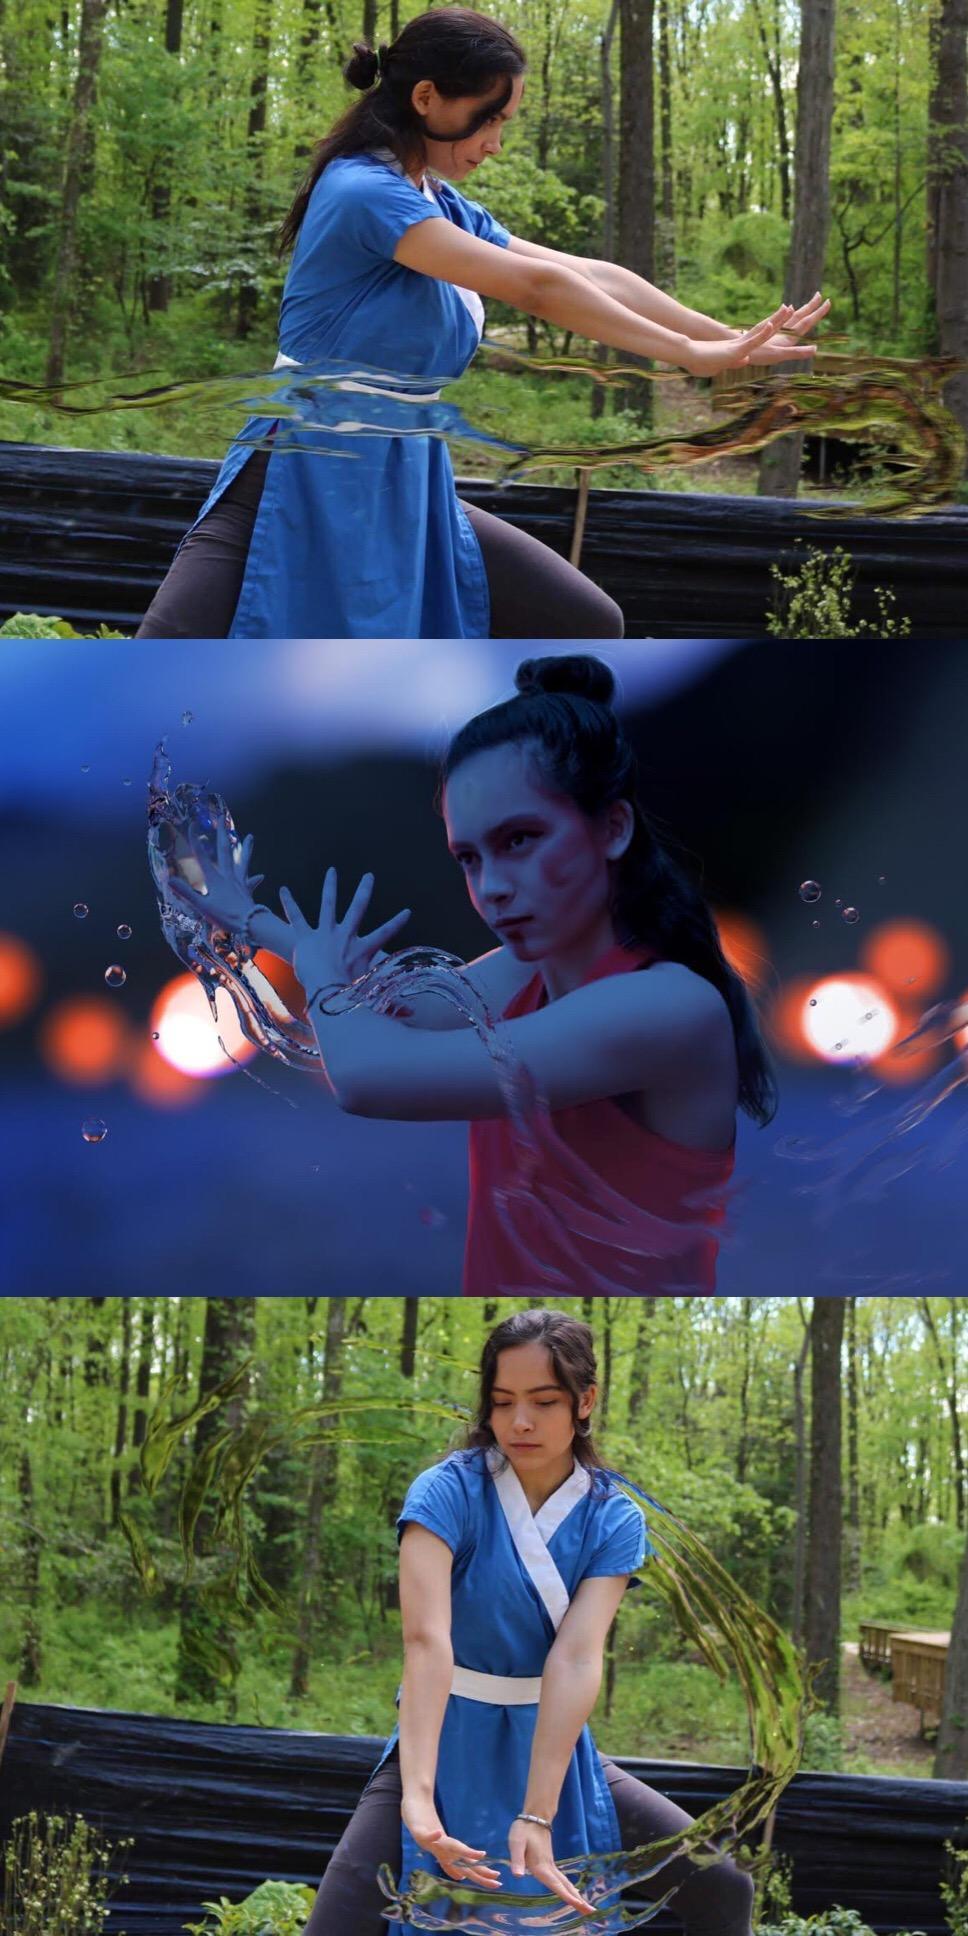 Audition For Avatar The Last Airbender Netflix : audition, avatar, airbender, netflix, Friend, Ronnie, Going, Tryout, Netflix, Audition,, Follow, Instagram, Love!, Https://www.instagram.com/katararon, TheLastAirbender